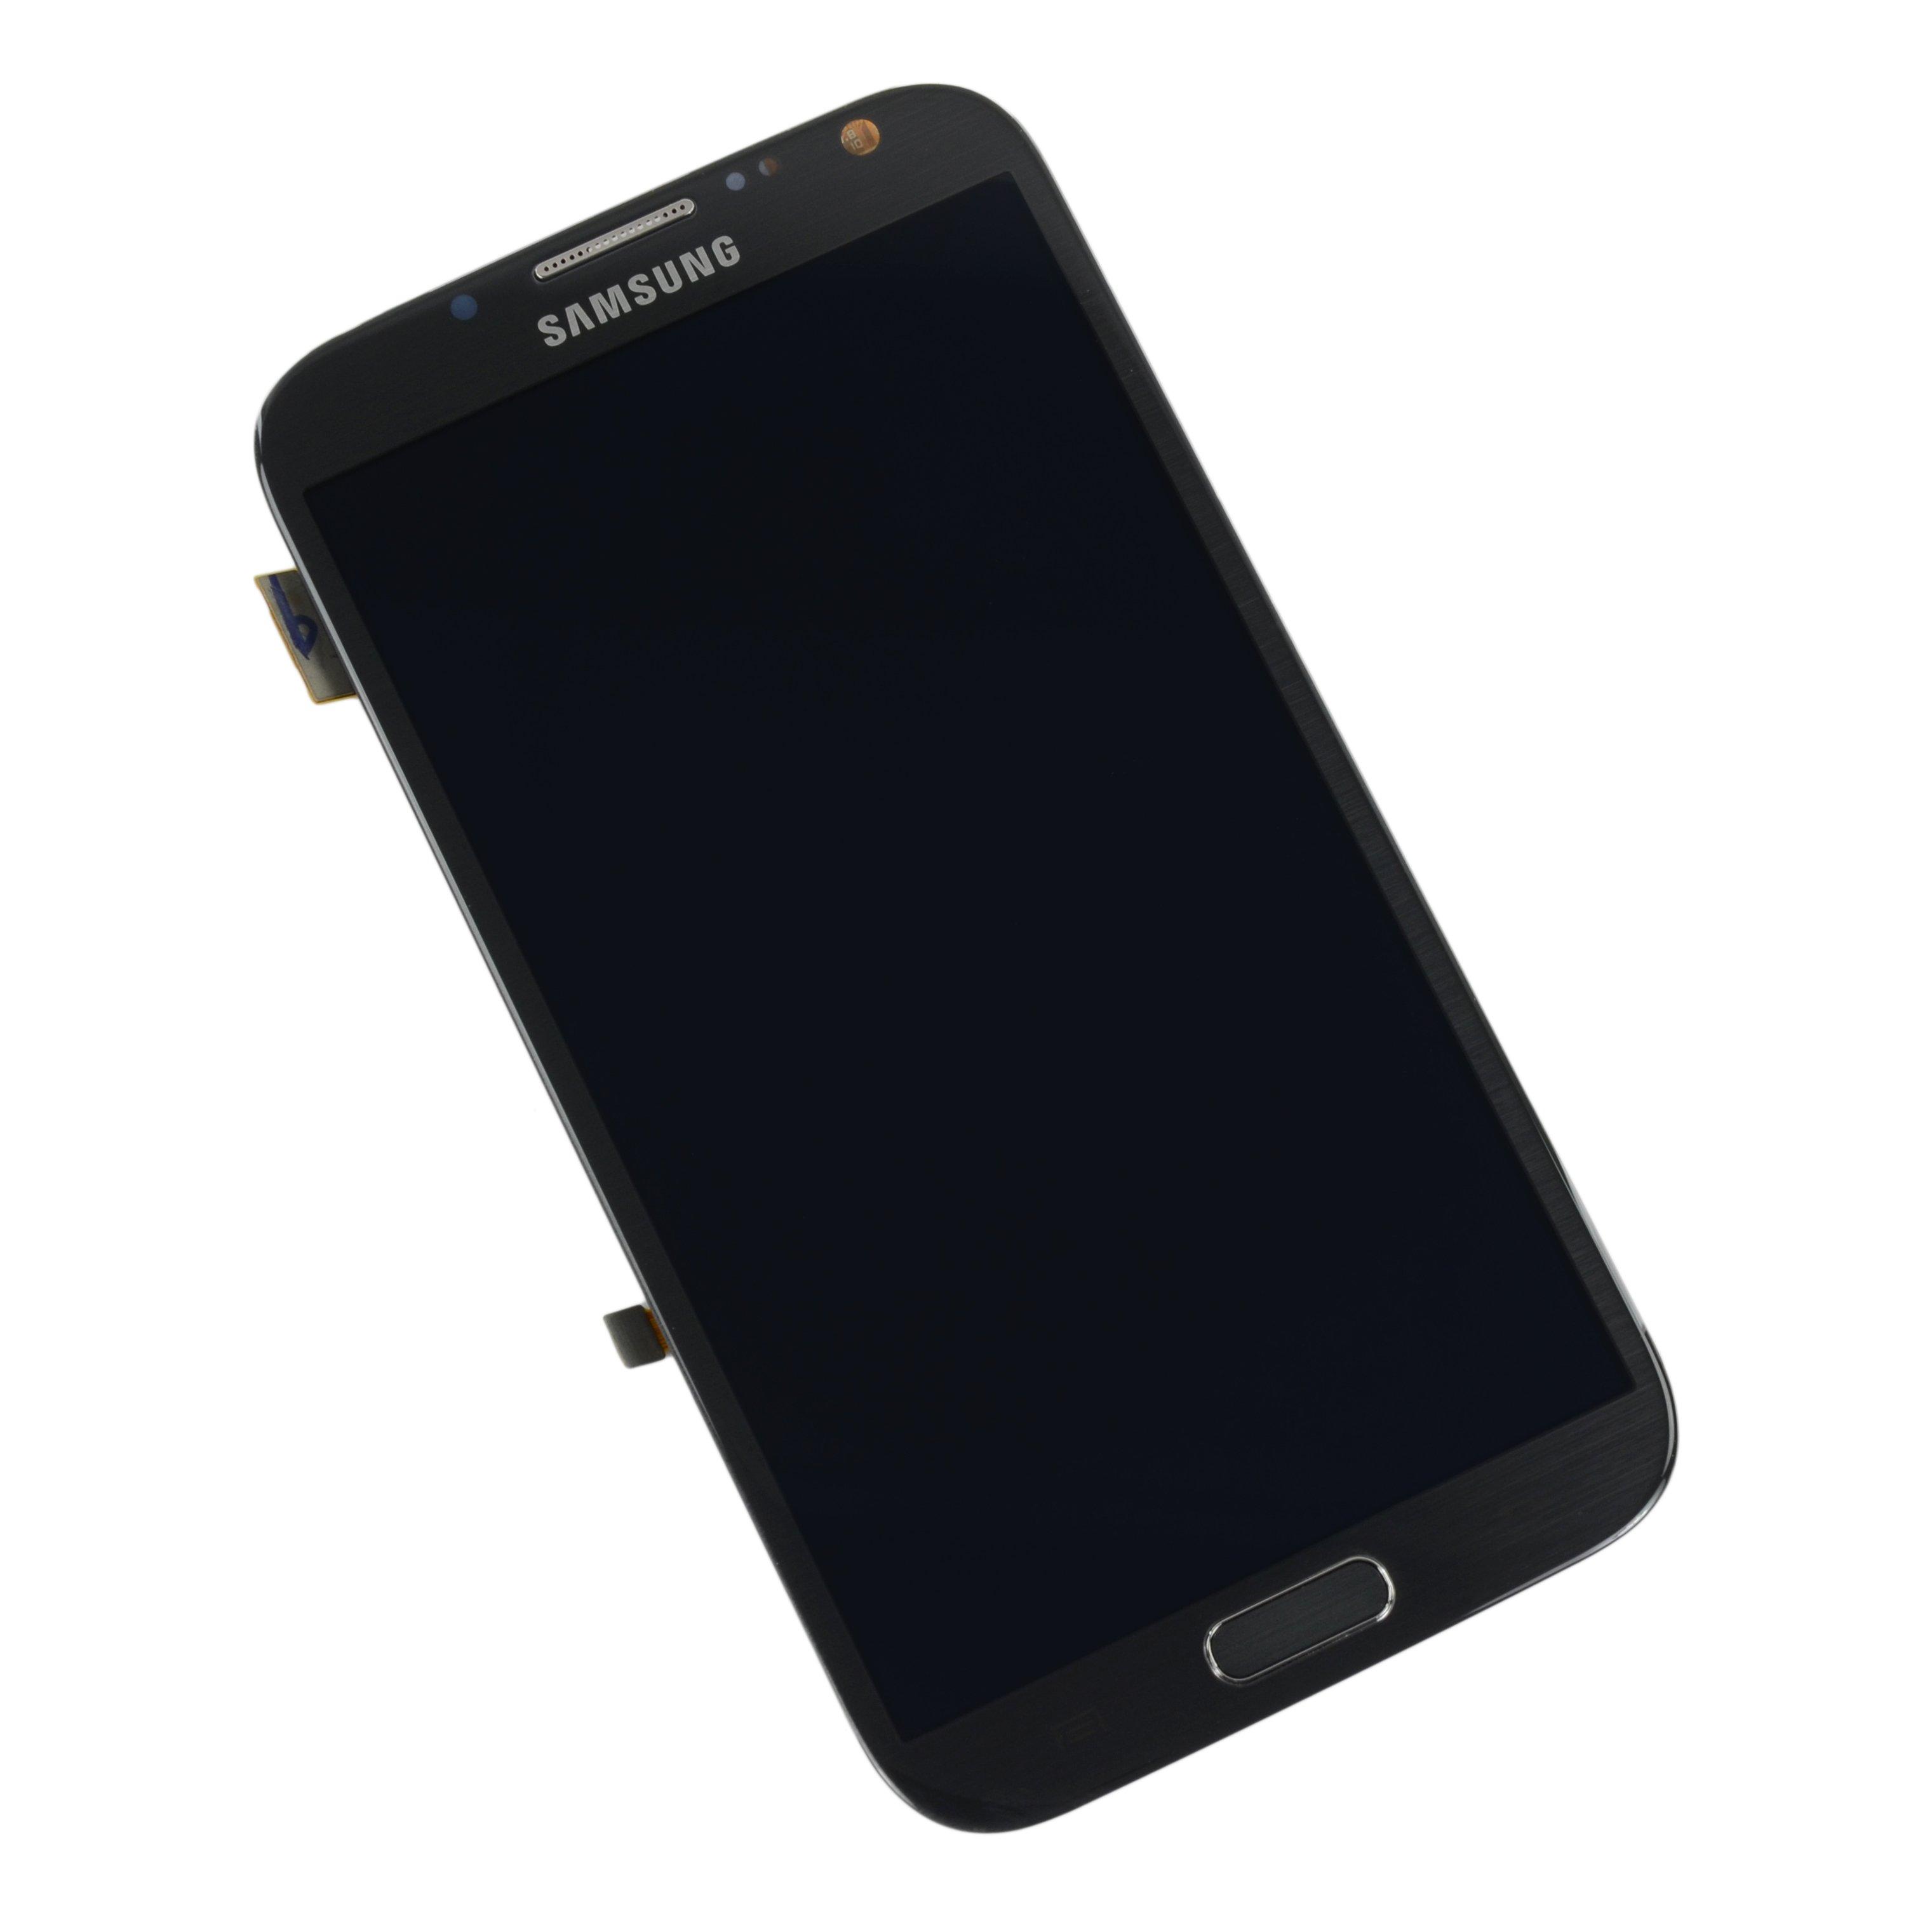 Galaxy Note II (Sprint/Verizon) Screenの画像